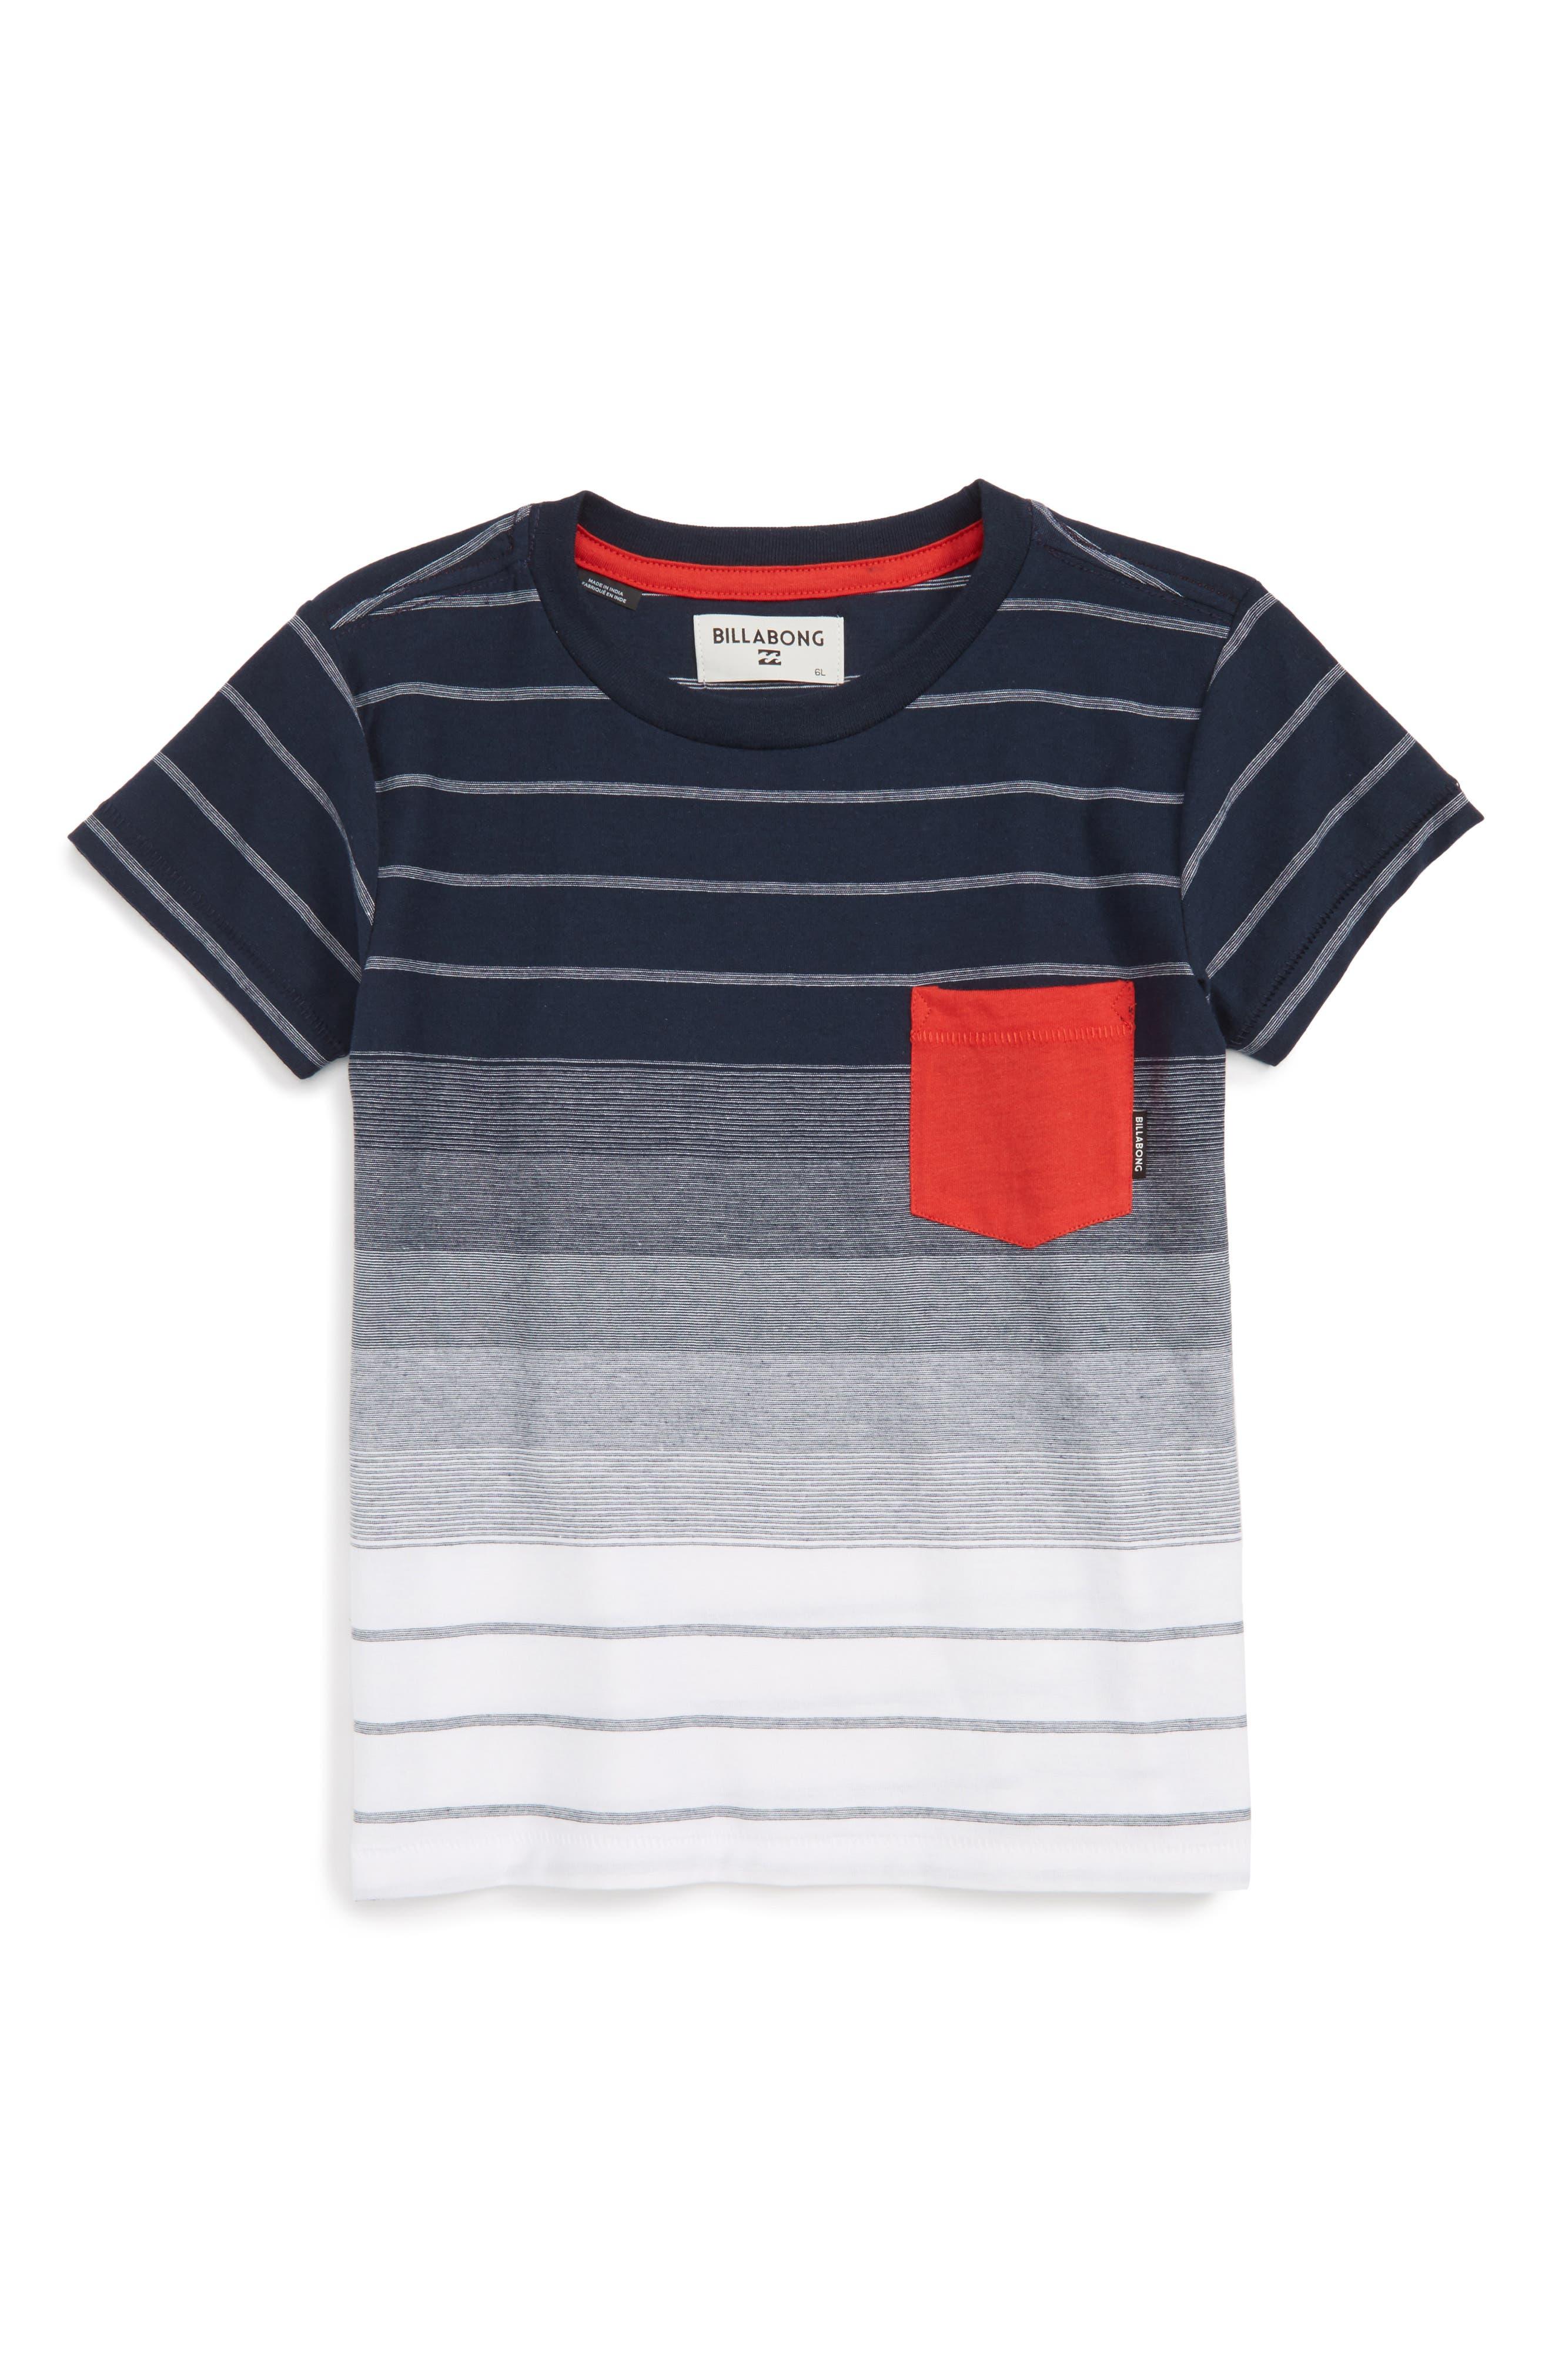 Billabong Faderade Pocket T-Shirt (Toddler Boys, Little Boys & Big Boys)